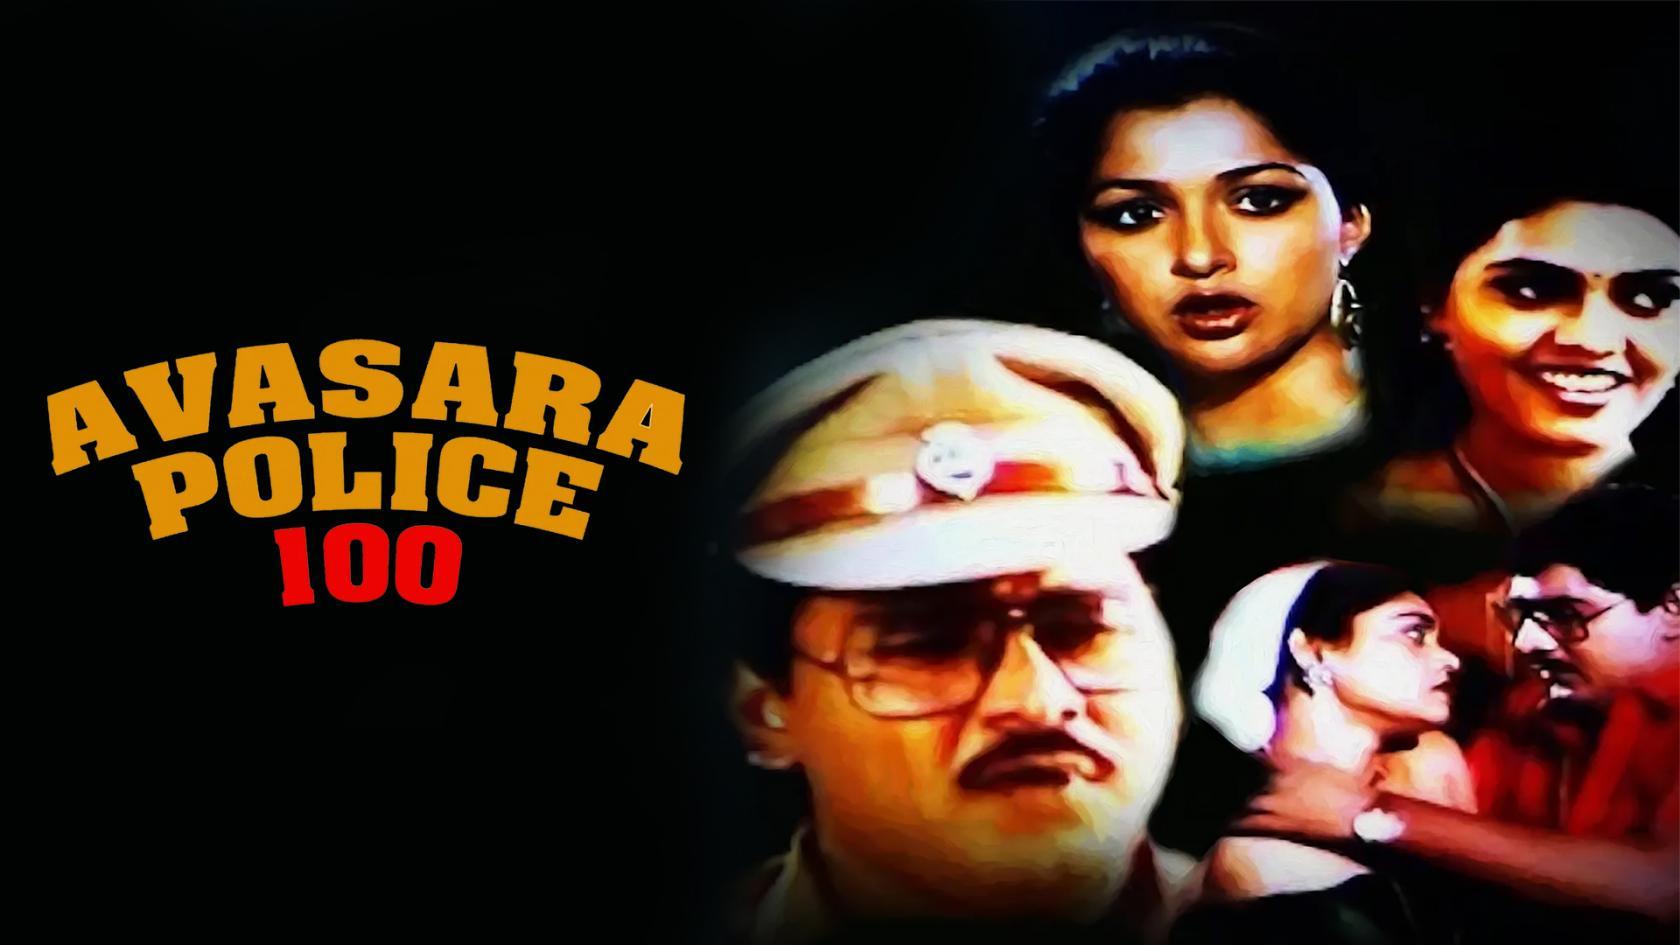 Avasara Police 100